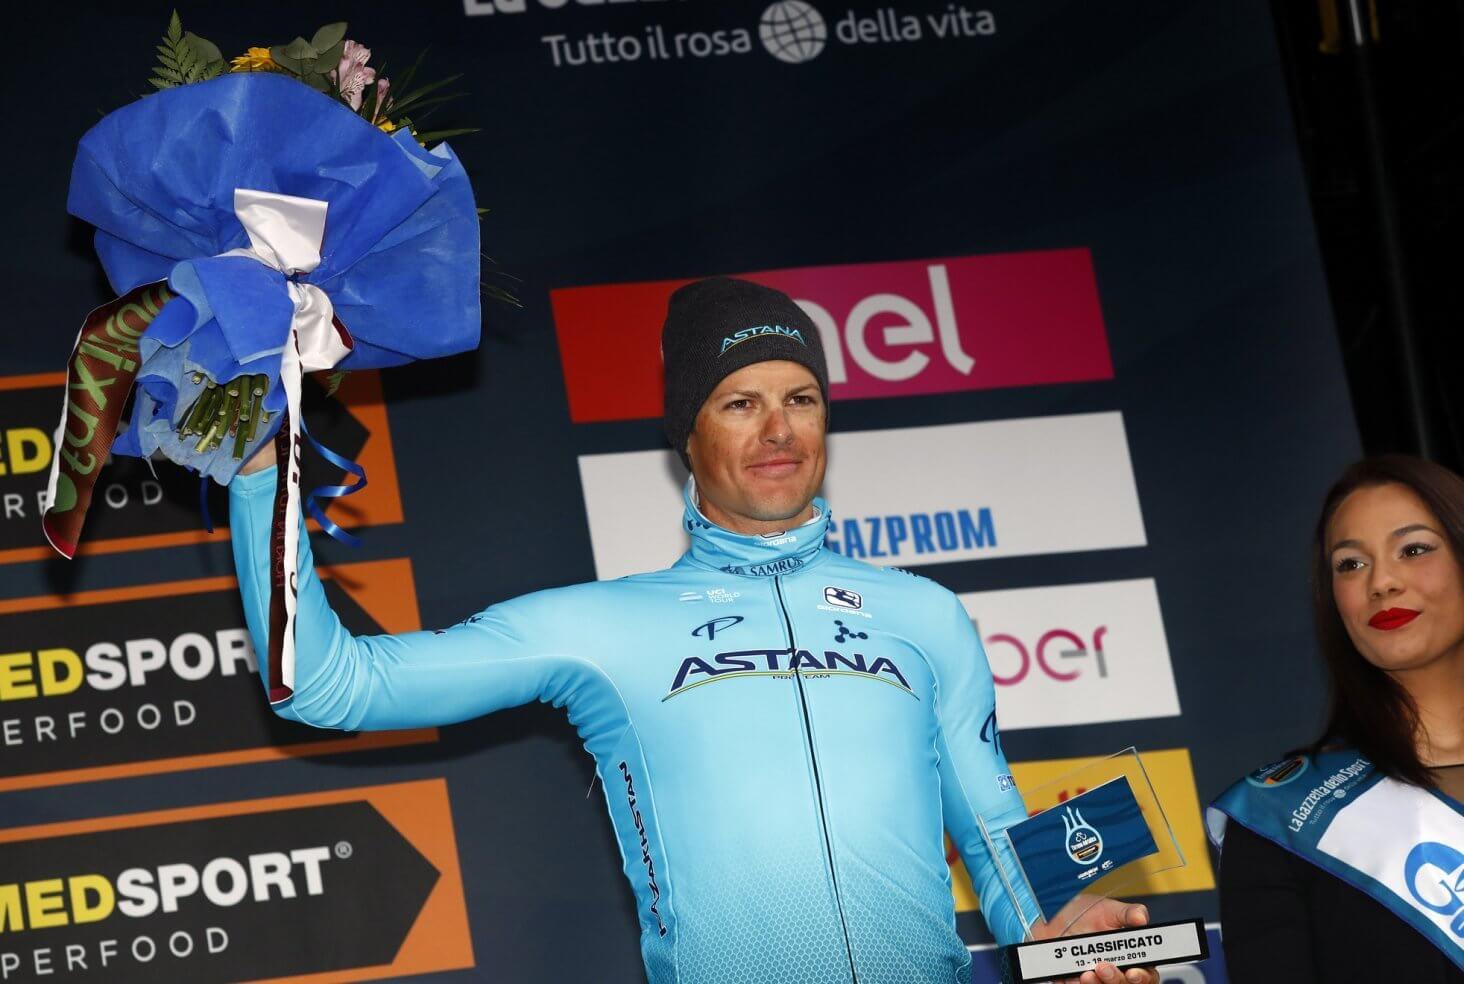 Northwave - Jakob Fuglsang & Northwave seal Tirreno-Adriatico's final podium